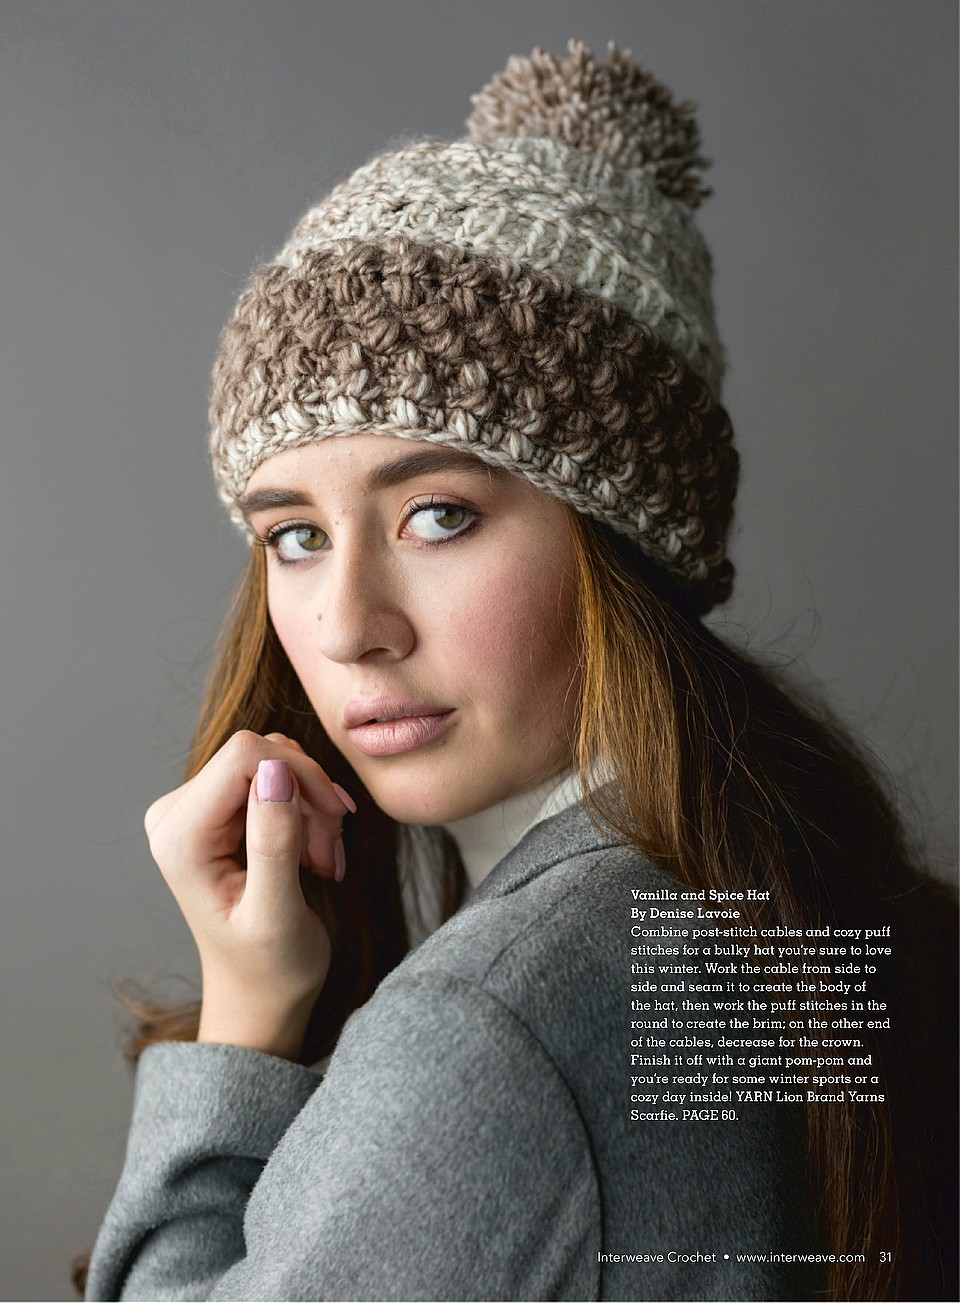 Interweave Crochet Winter 2019-32